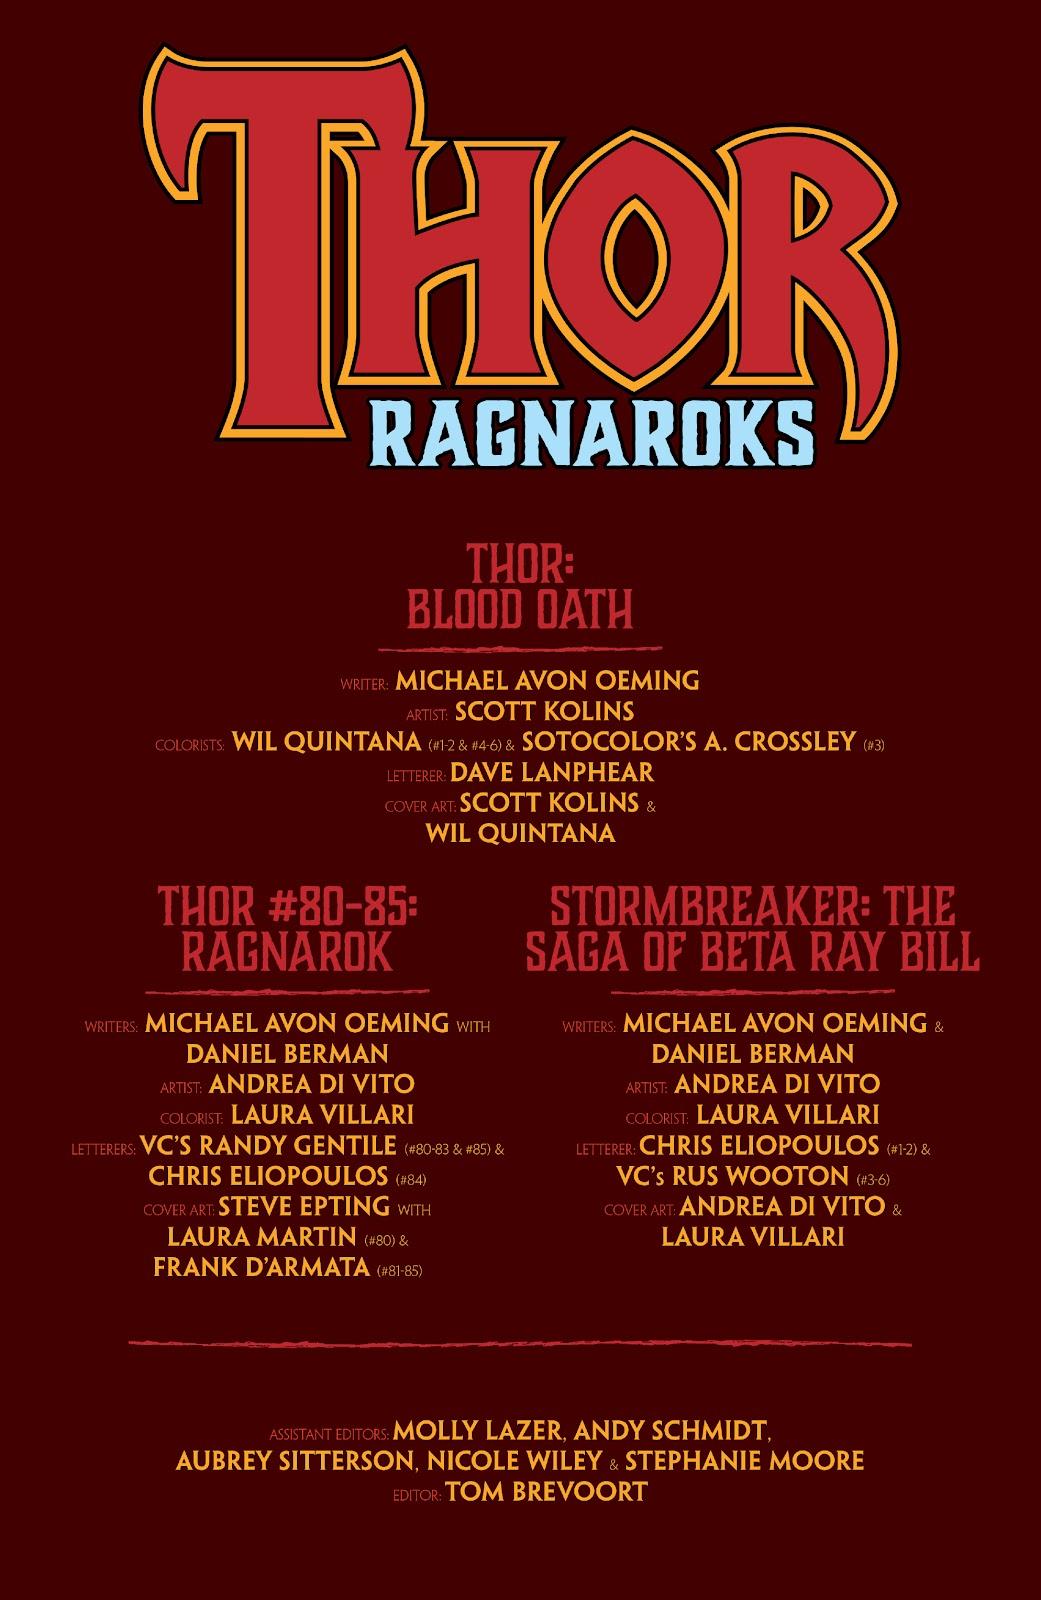 Read online Thor: Ragnaroks comic -  Issue # TPB (Part 1) - 4